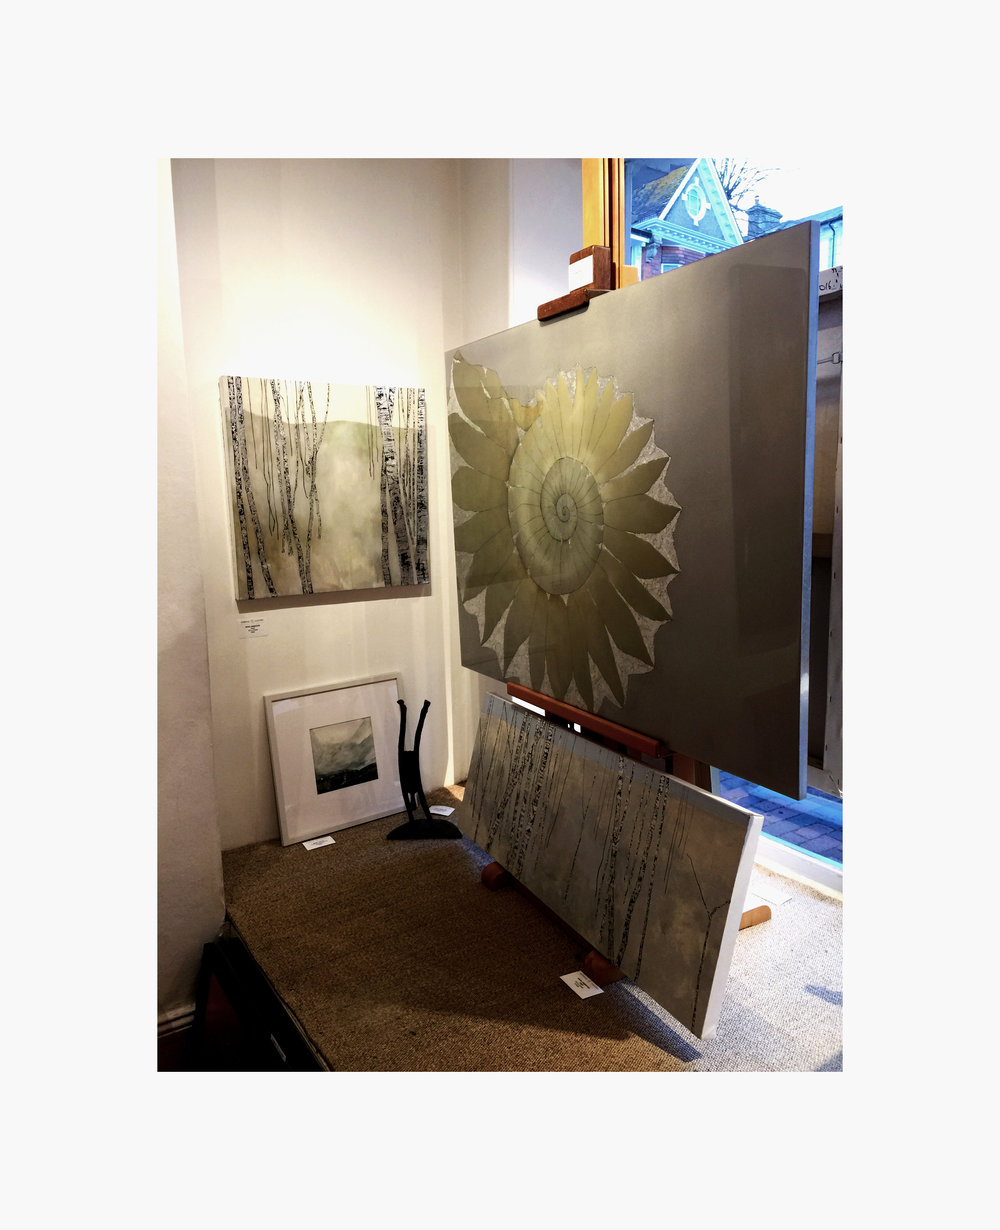 Ammonite and Birch Tree Paintings in Fairfax Gallery Tunbridge Wells